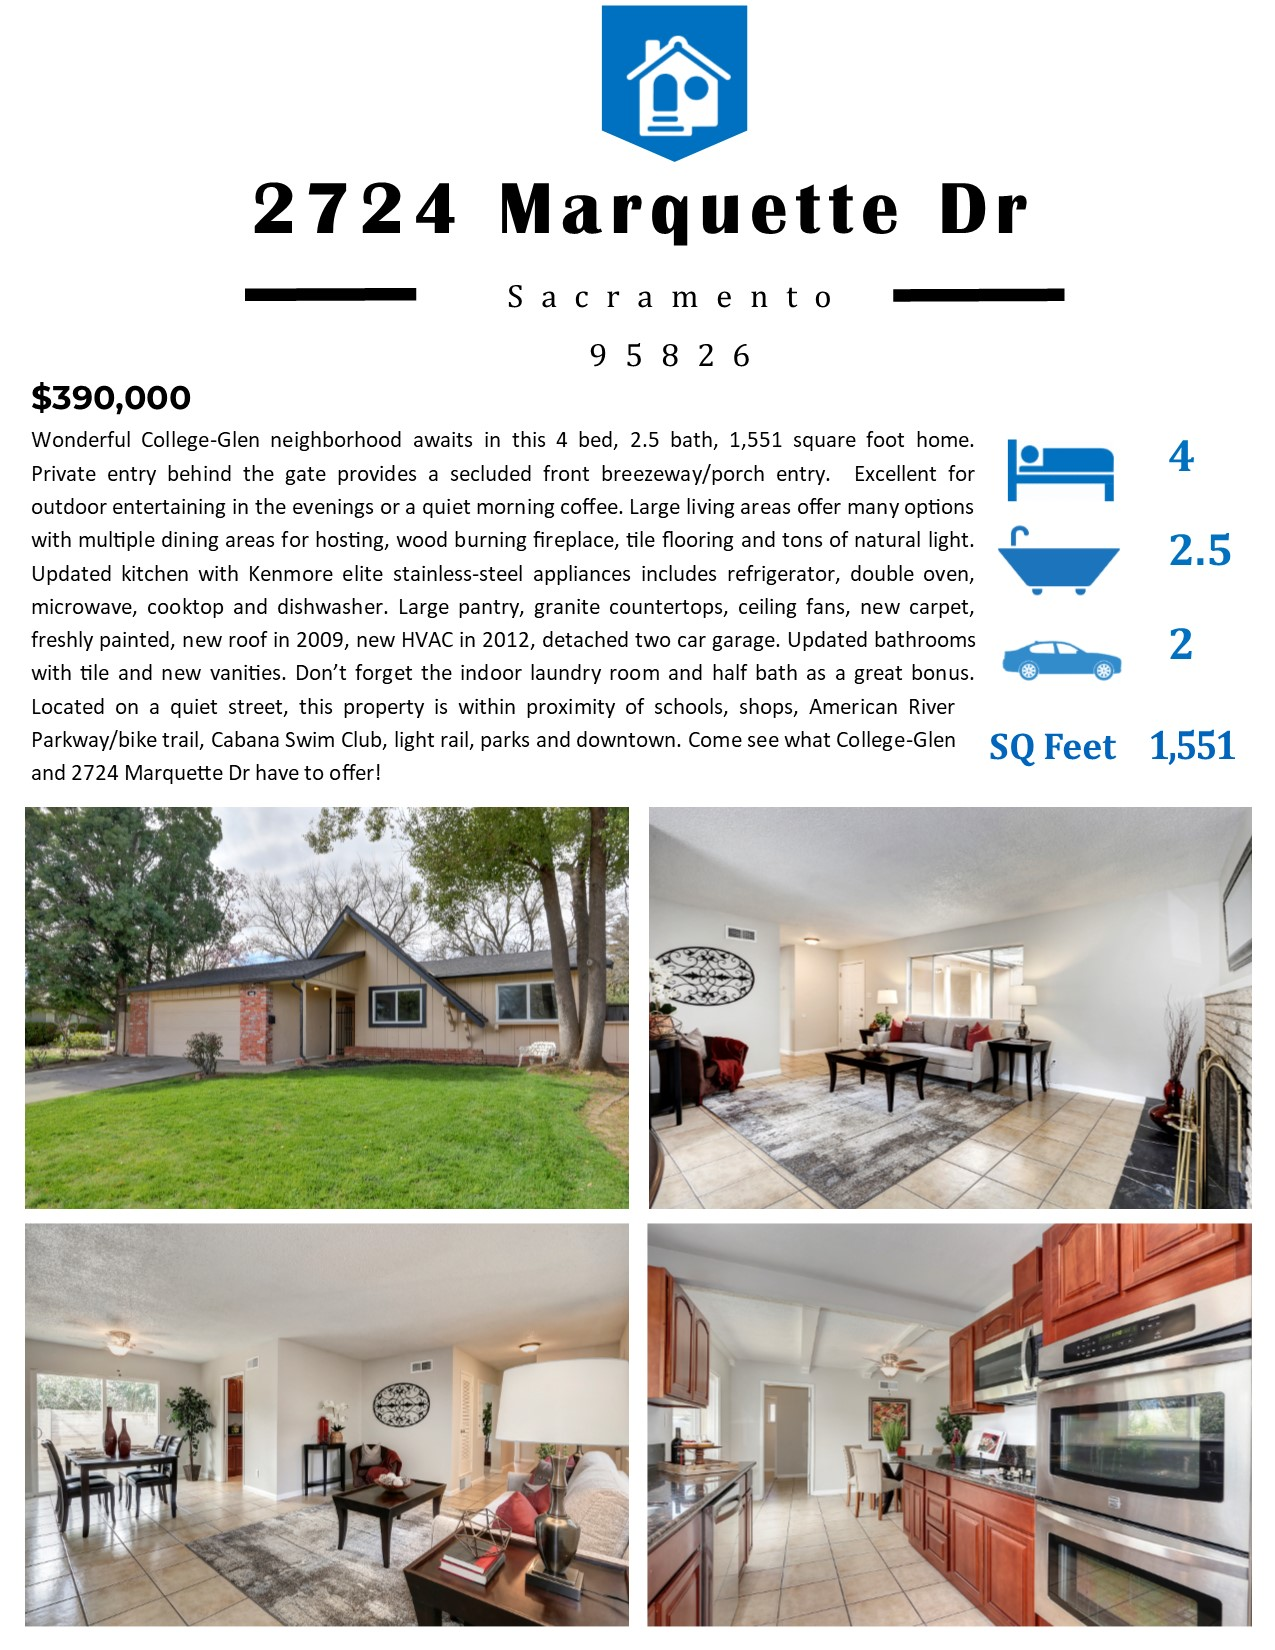 Flyer Front - 2724 Marquette Dr, Sacramento CA 95826.jpg